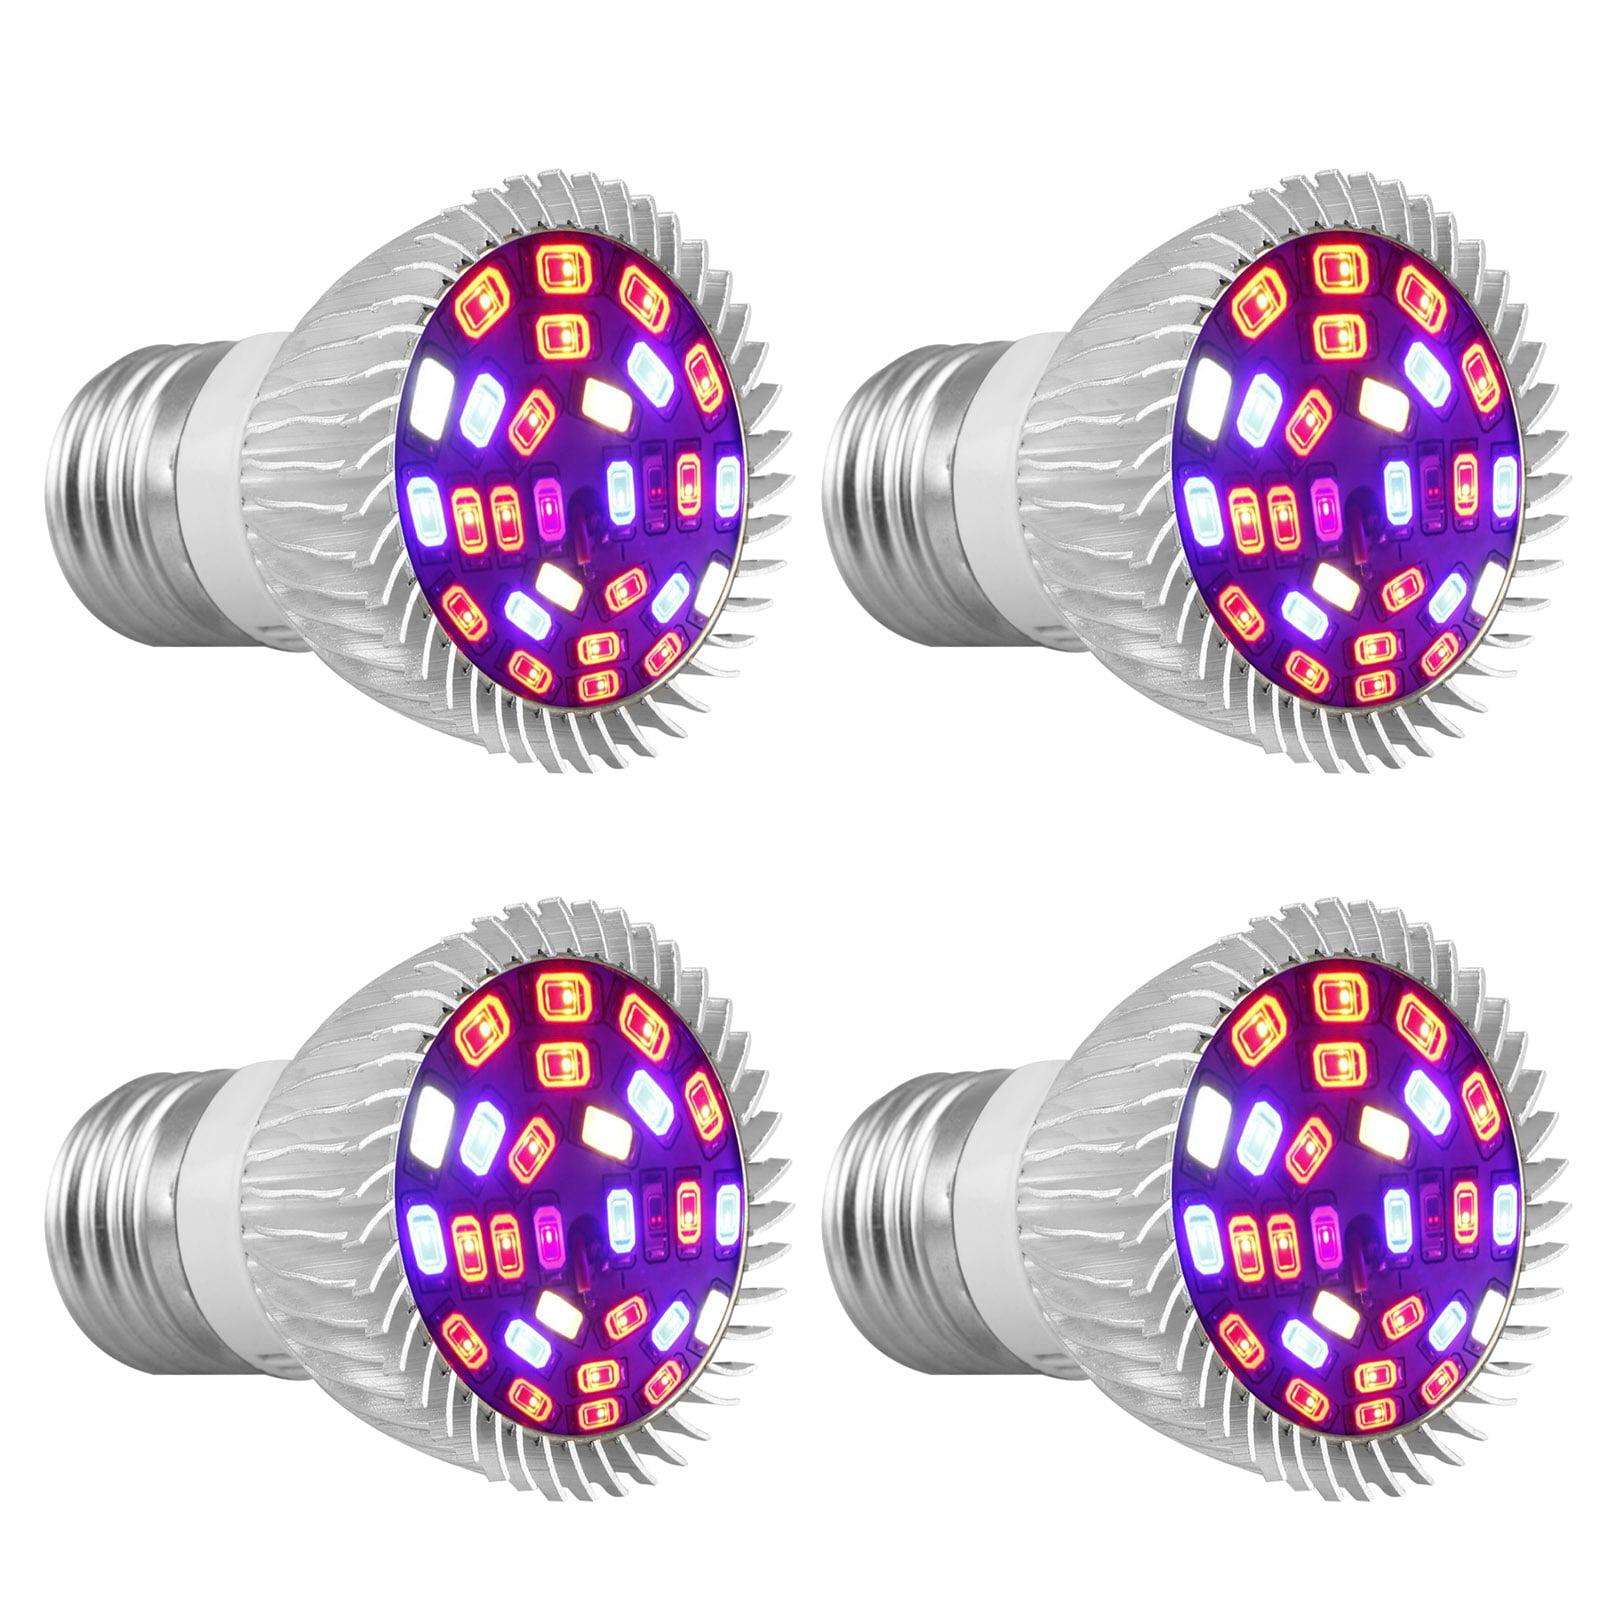 4-pack 28W Full Spectrum E26 E27 LEDs Grow Light Bulbs for Hydroponics Greenhouse Organic Indoor Plants